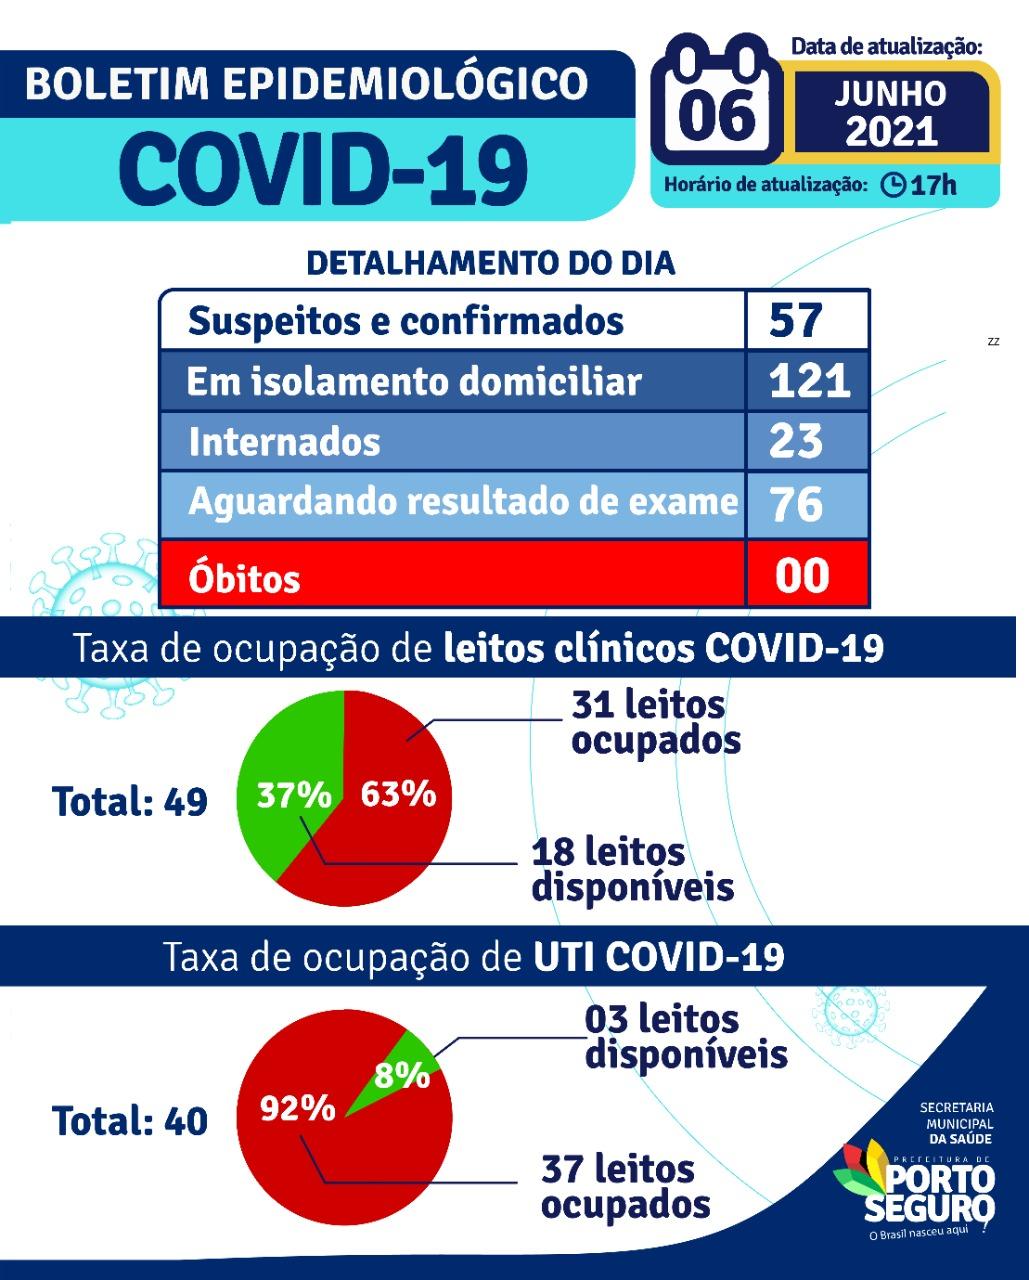 Porto Seguro: Boletim Epidemiológico Covid-19 (06/Junho) 22